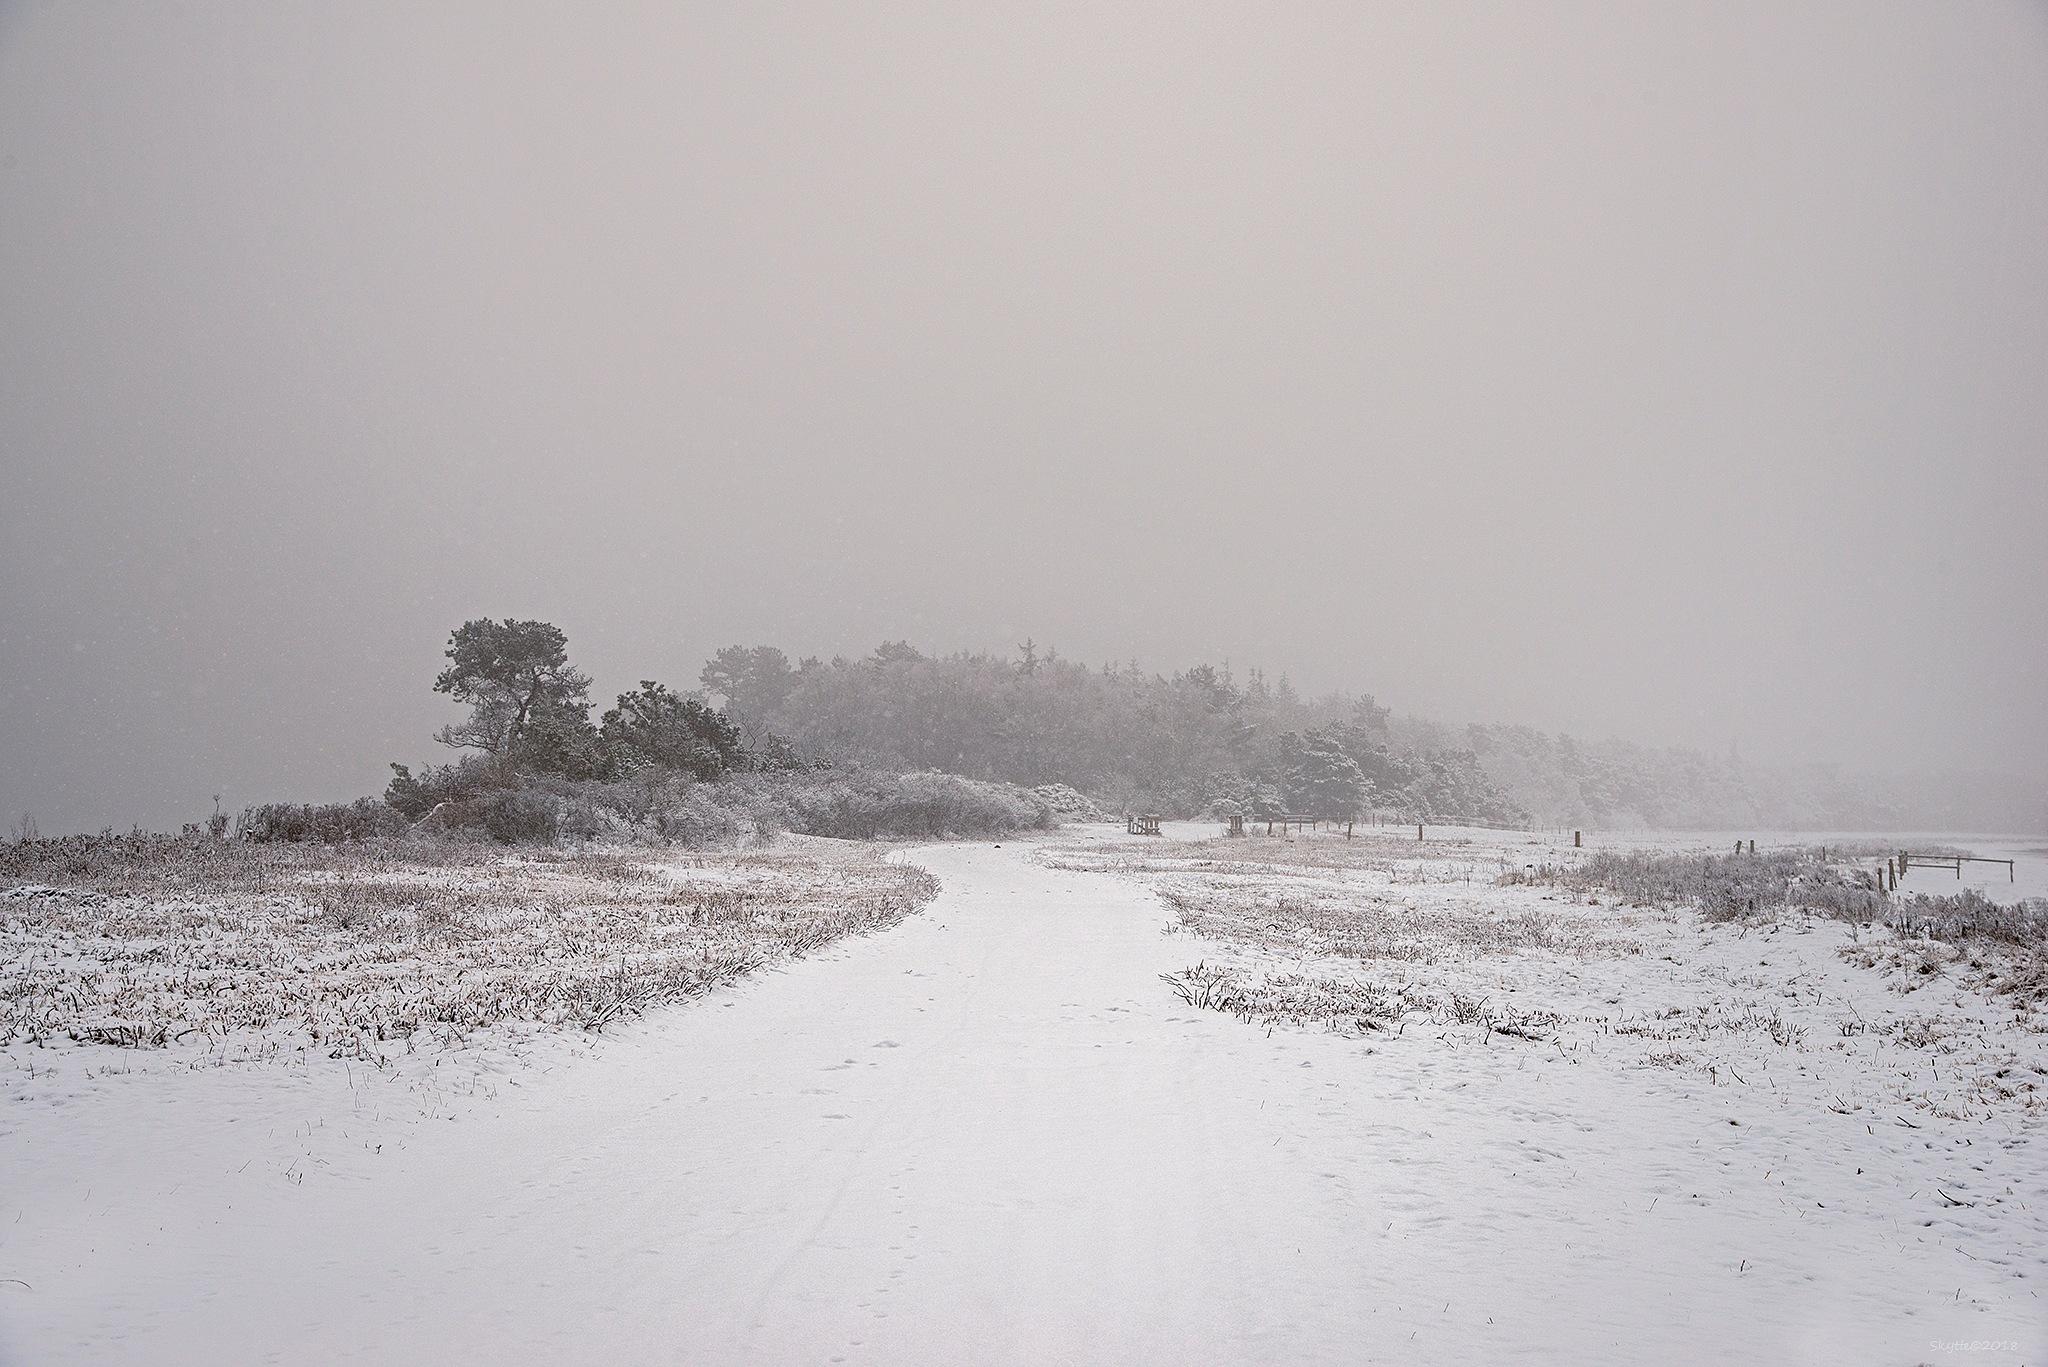 Winter. by Keld Skytte Petersen